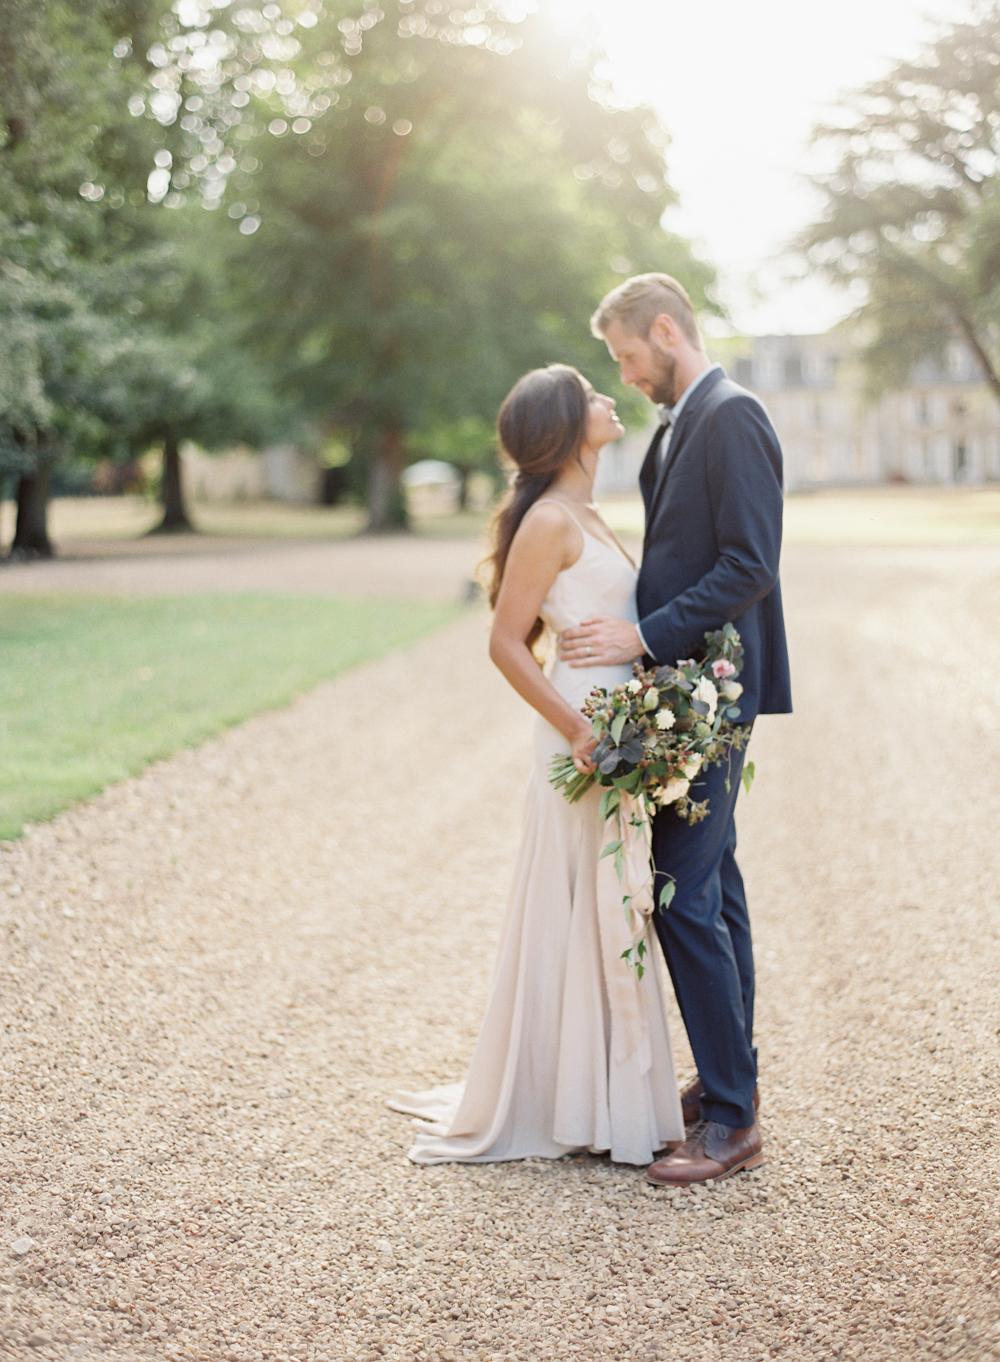 Vicki Grafton Photography Paris France Chateau wedding  Film Wedding photographer -6.jpg